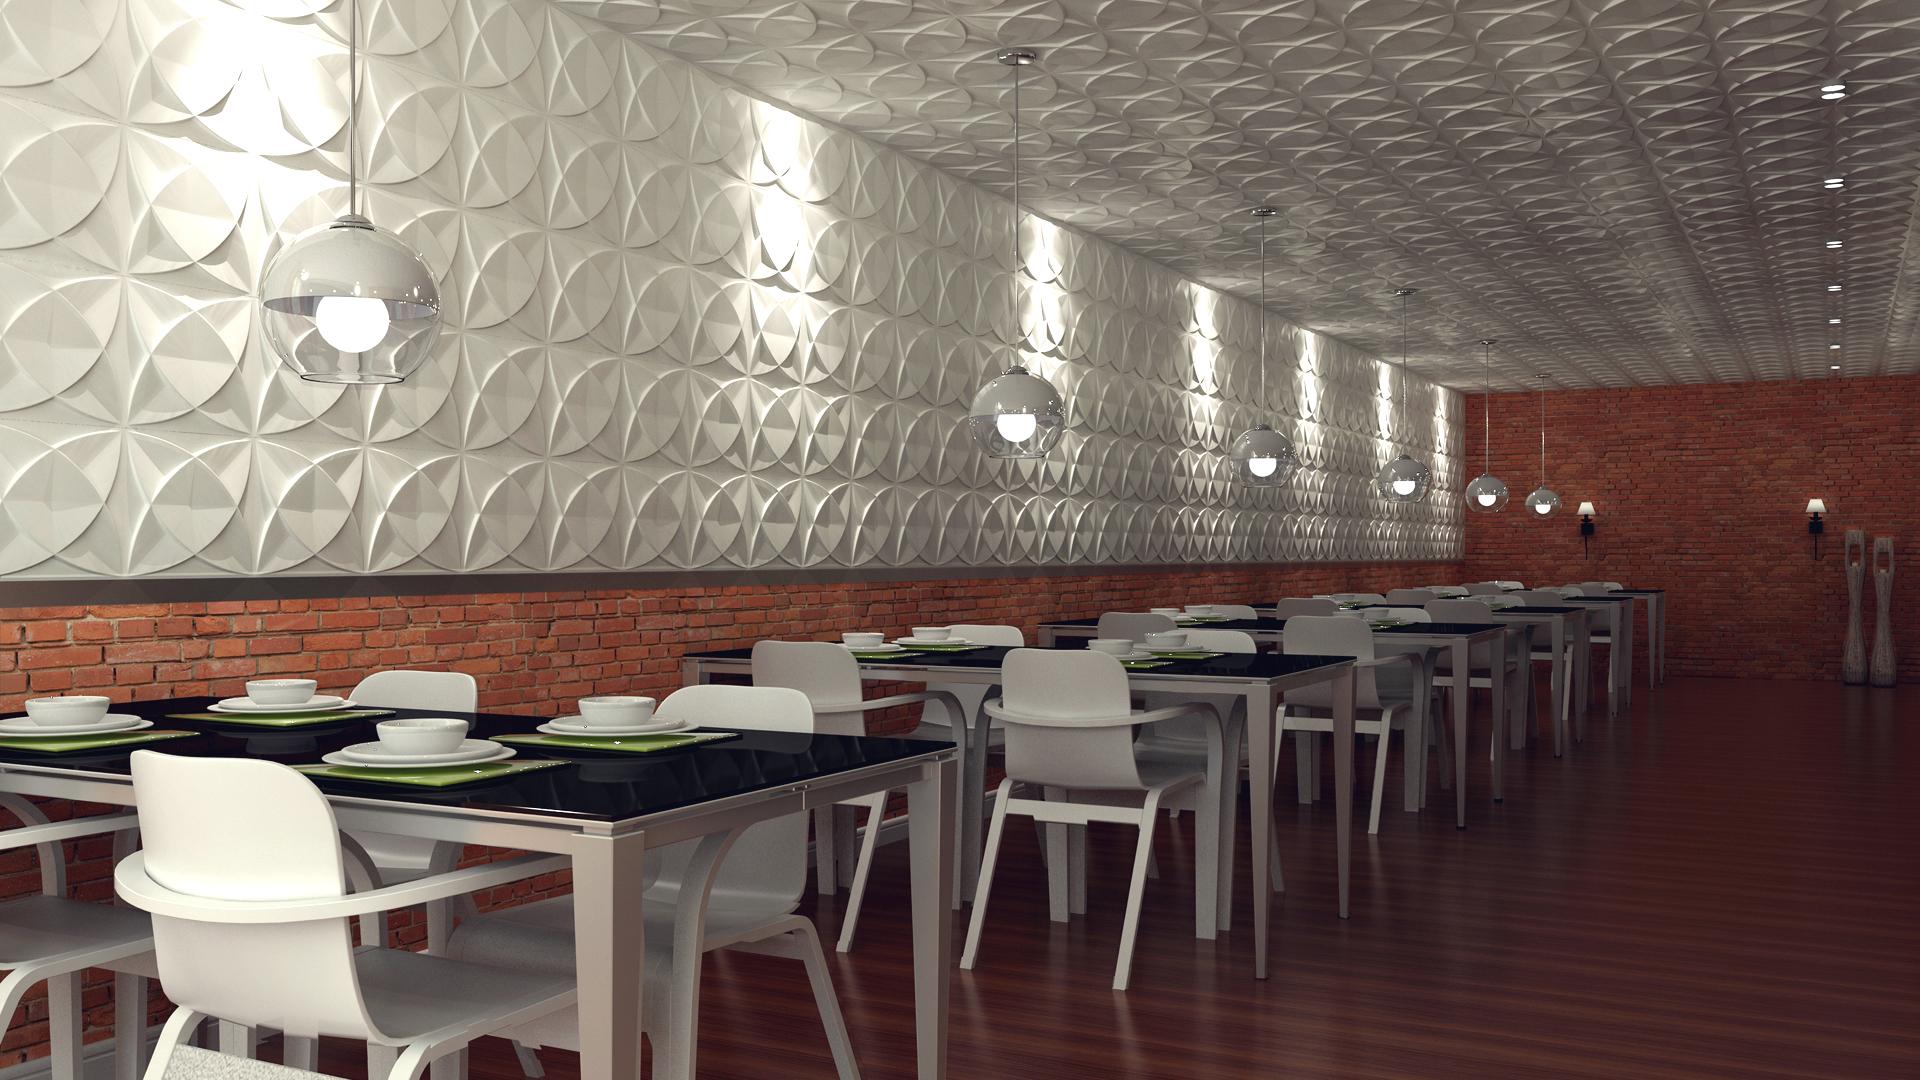 design ideen • 3d wandpaneele | deckenpaneele | wandverkleidung aus